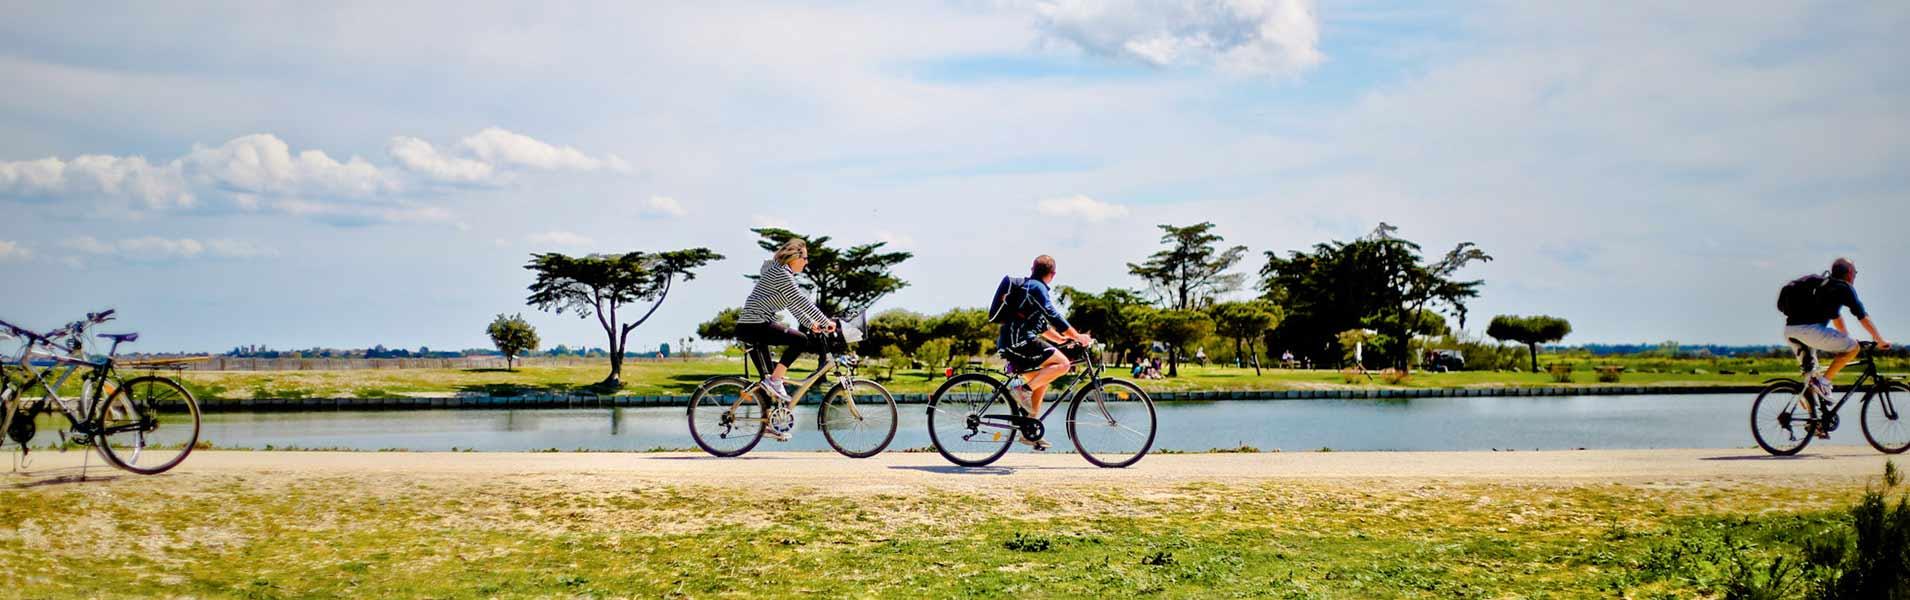 Fahrradverleih auf der île de ré